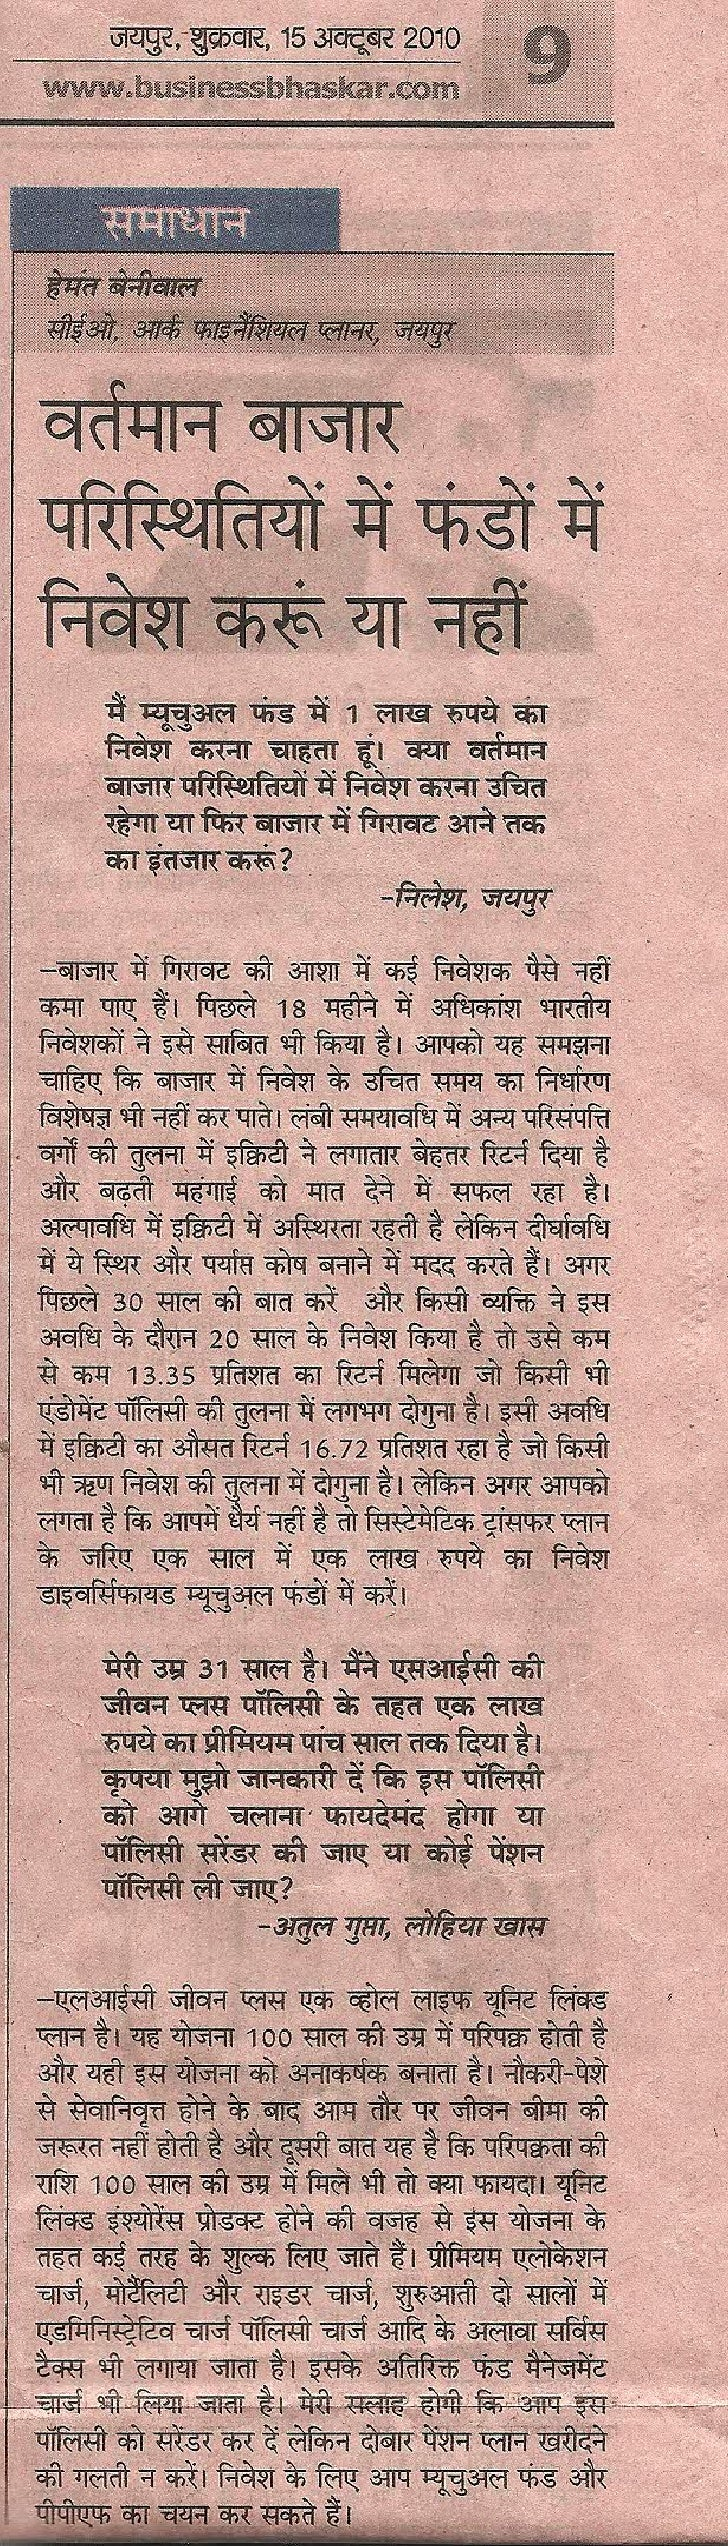 Business Bhaskar 15.10.2010